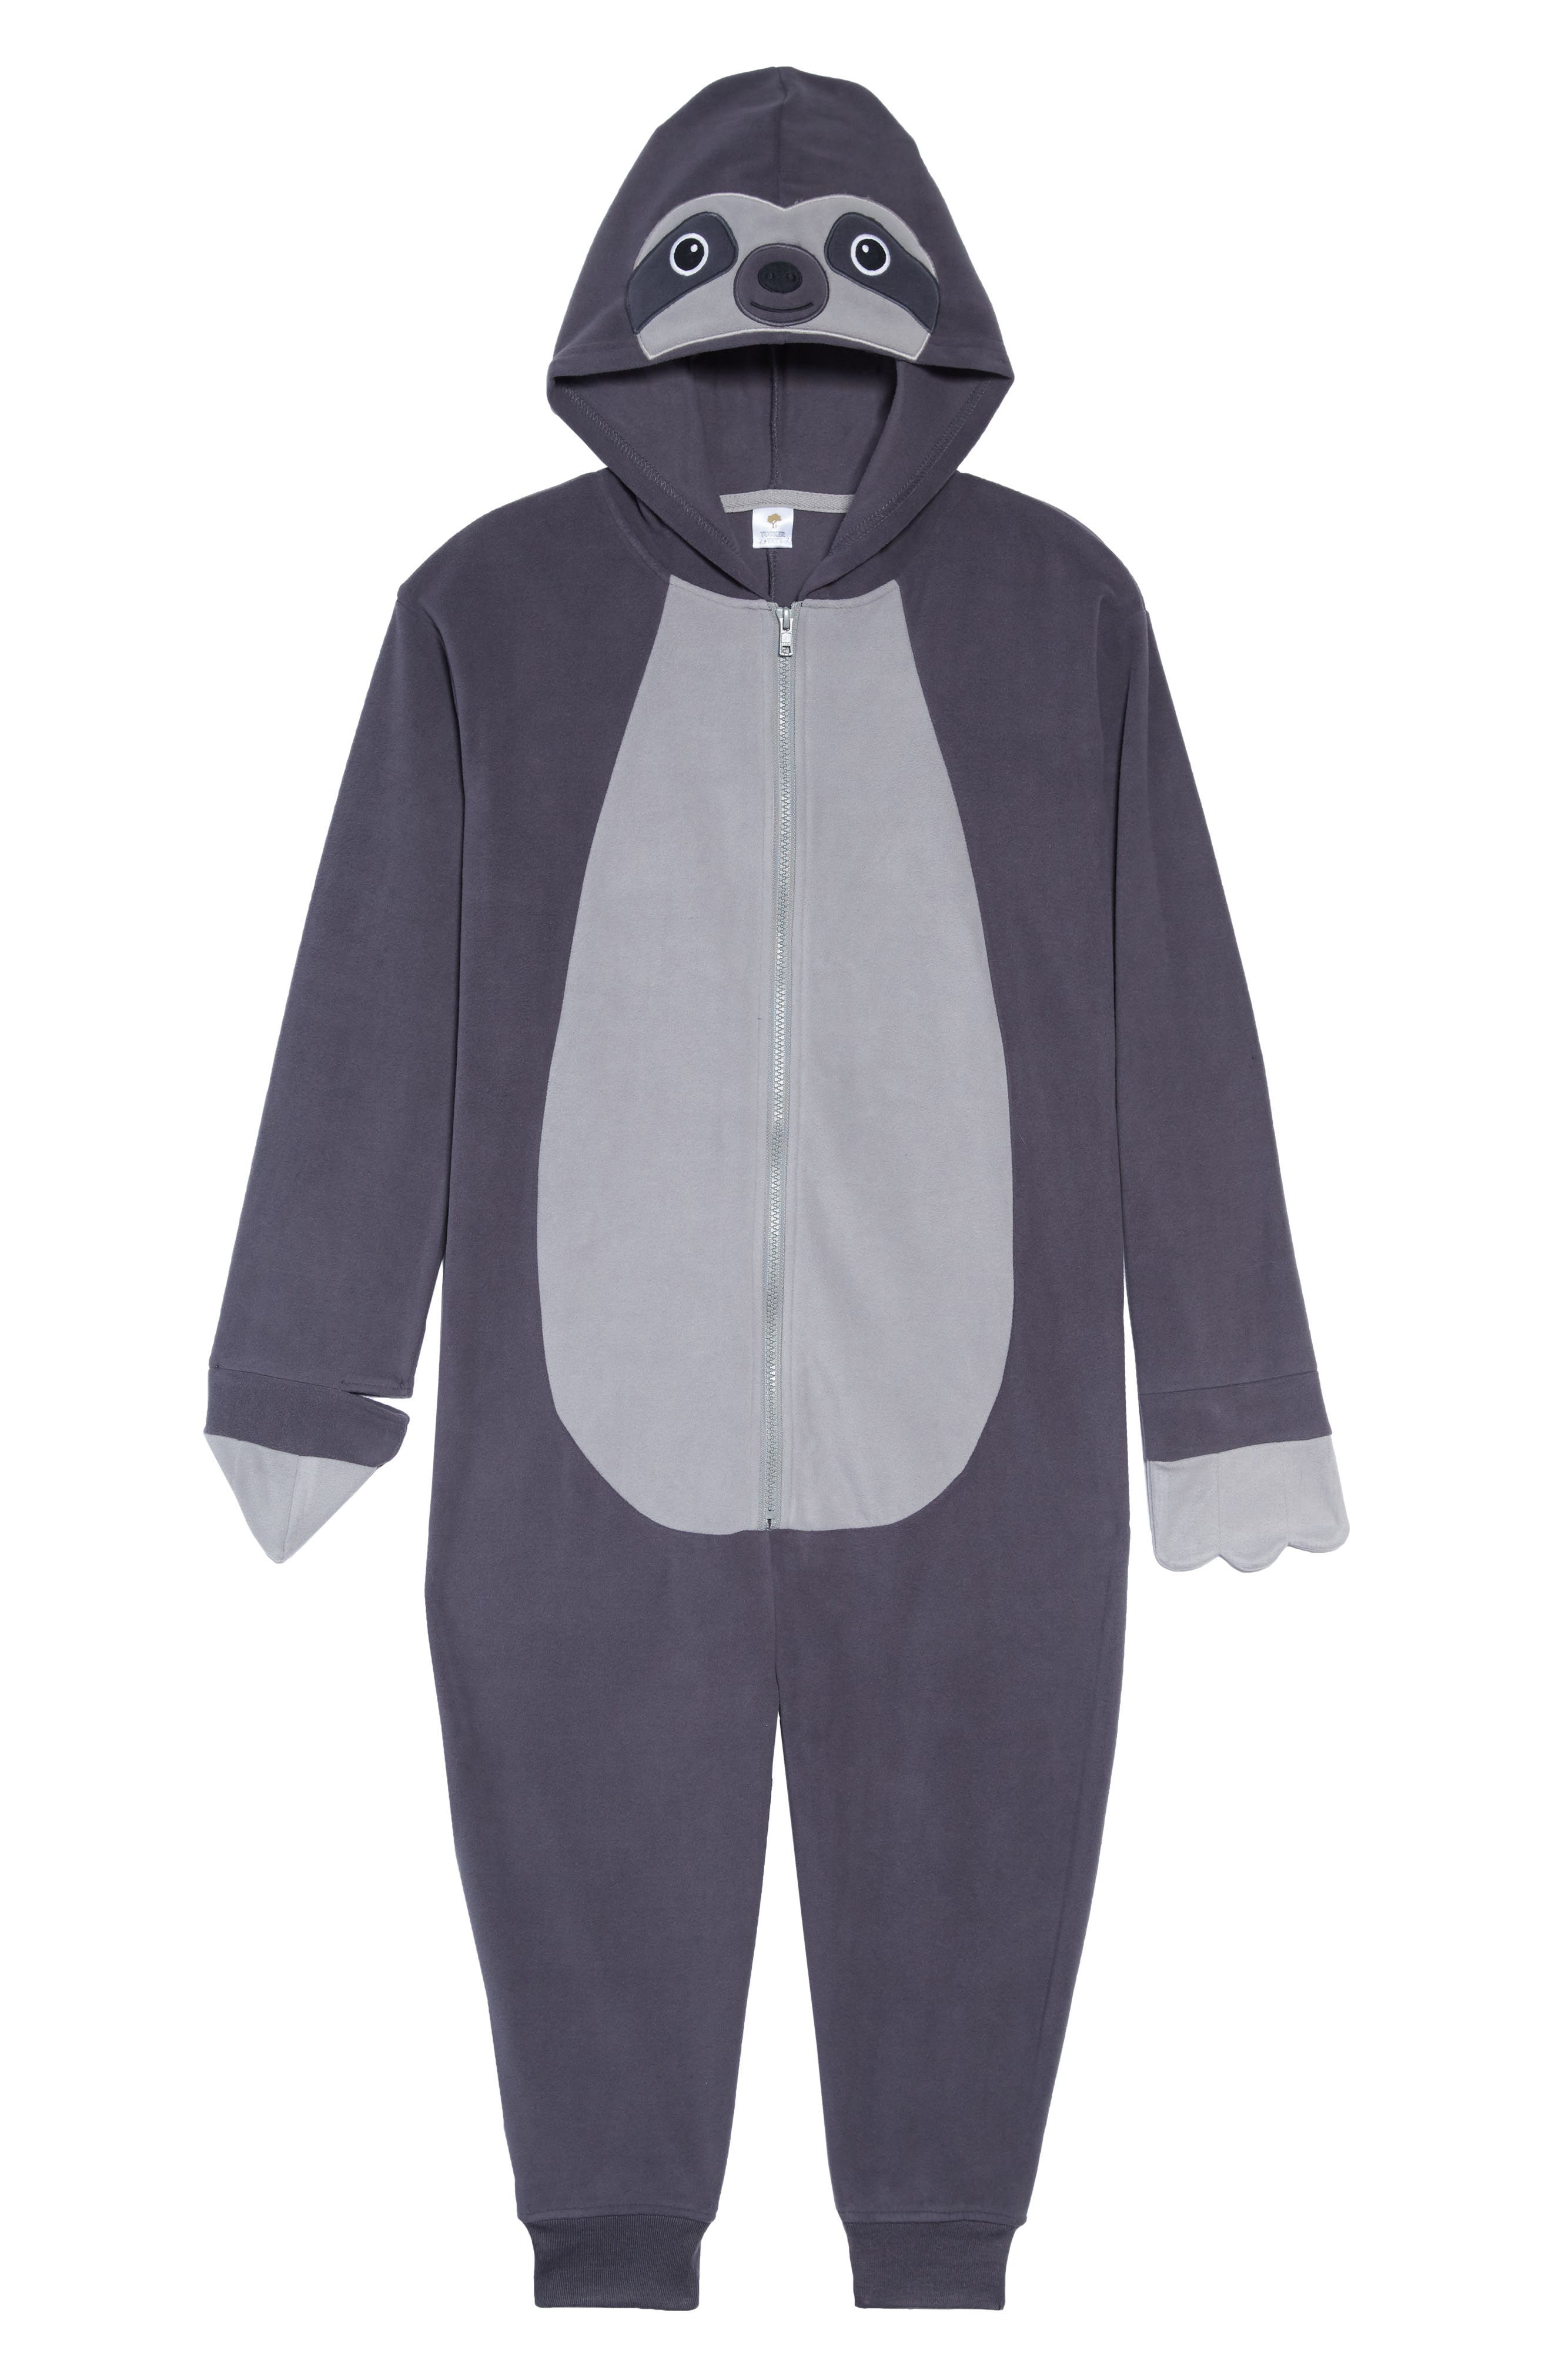 TUCKER + TATE Sloth Hooded One-Piece Pajamas, Main, color, 021